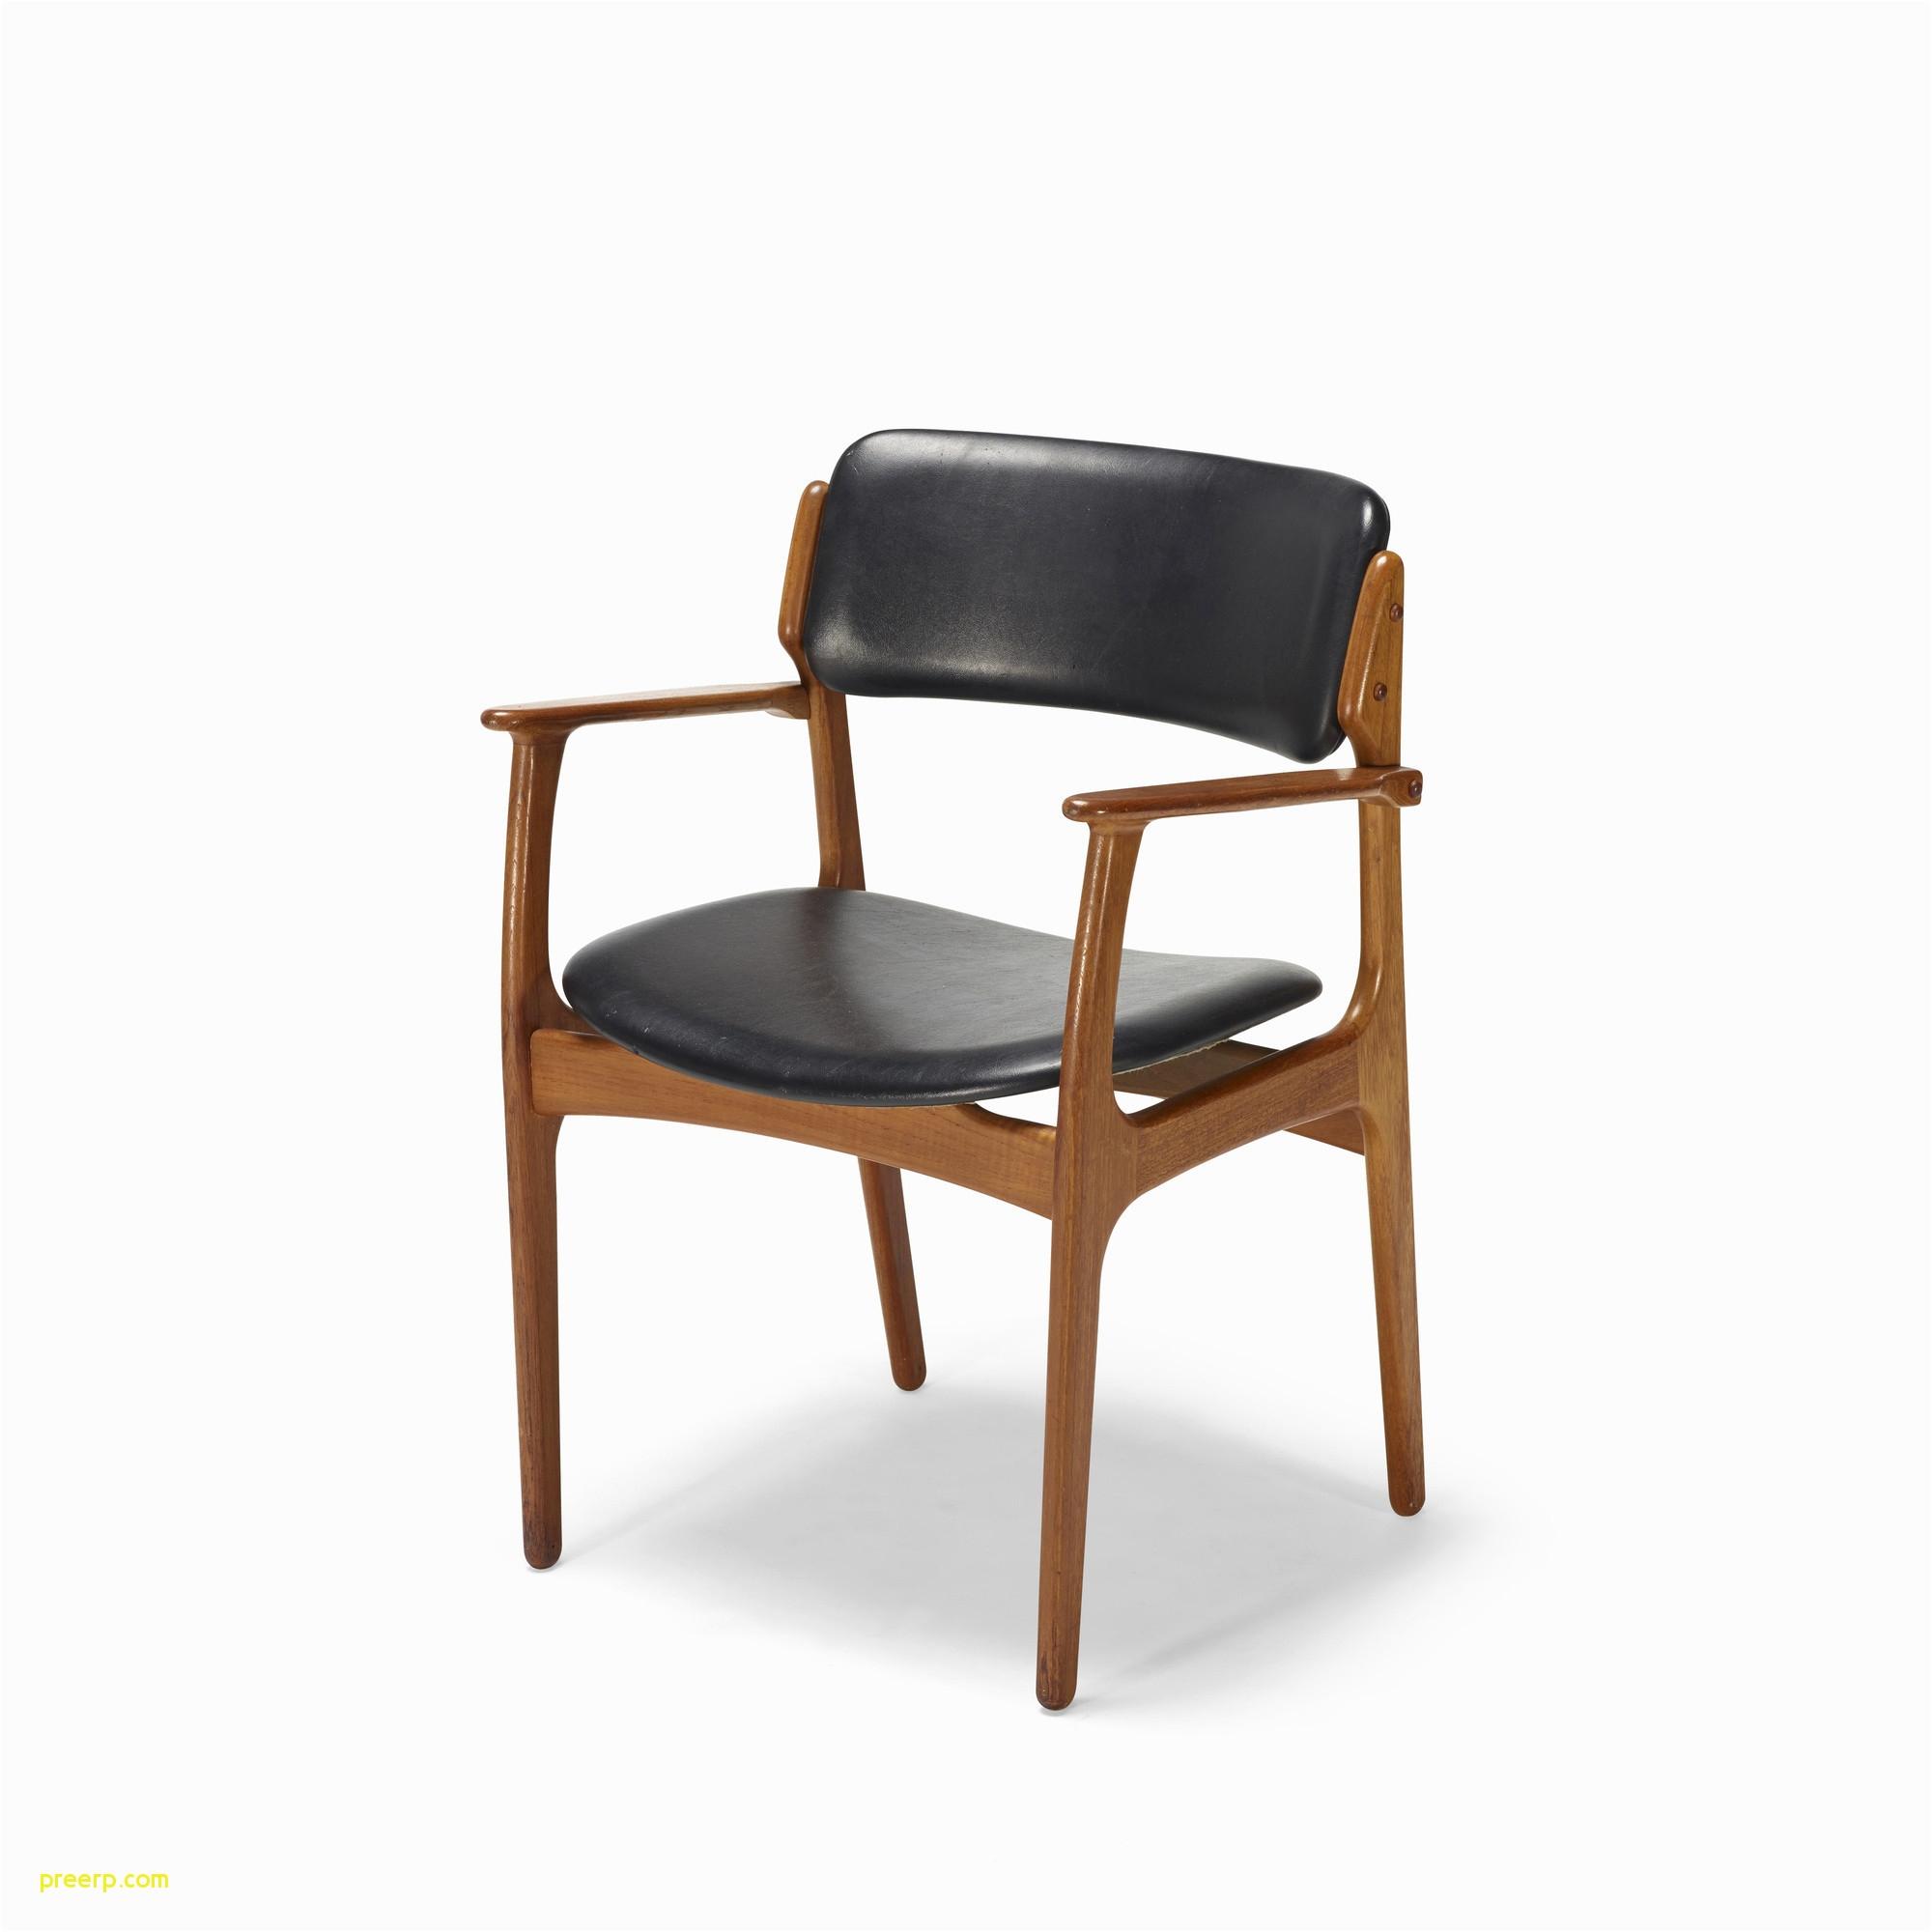 Rattan Tation Chair Australia Outdoor White Furniture Fine Balcony Best